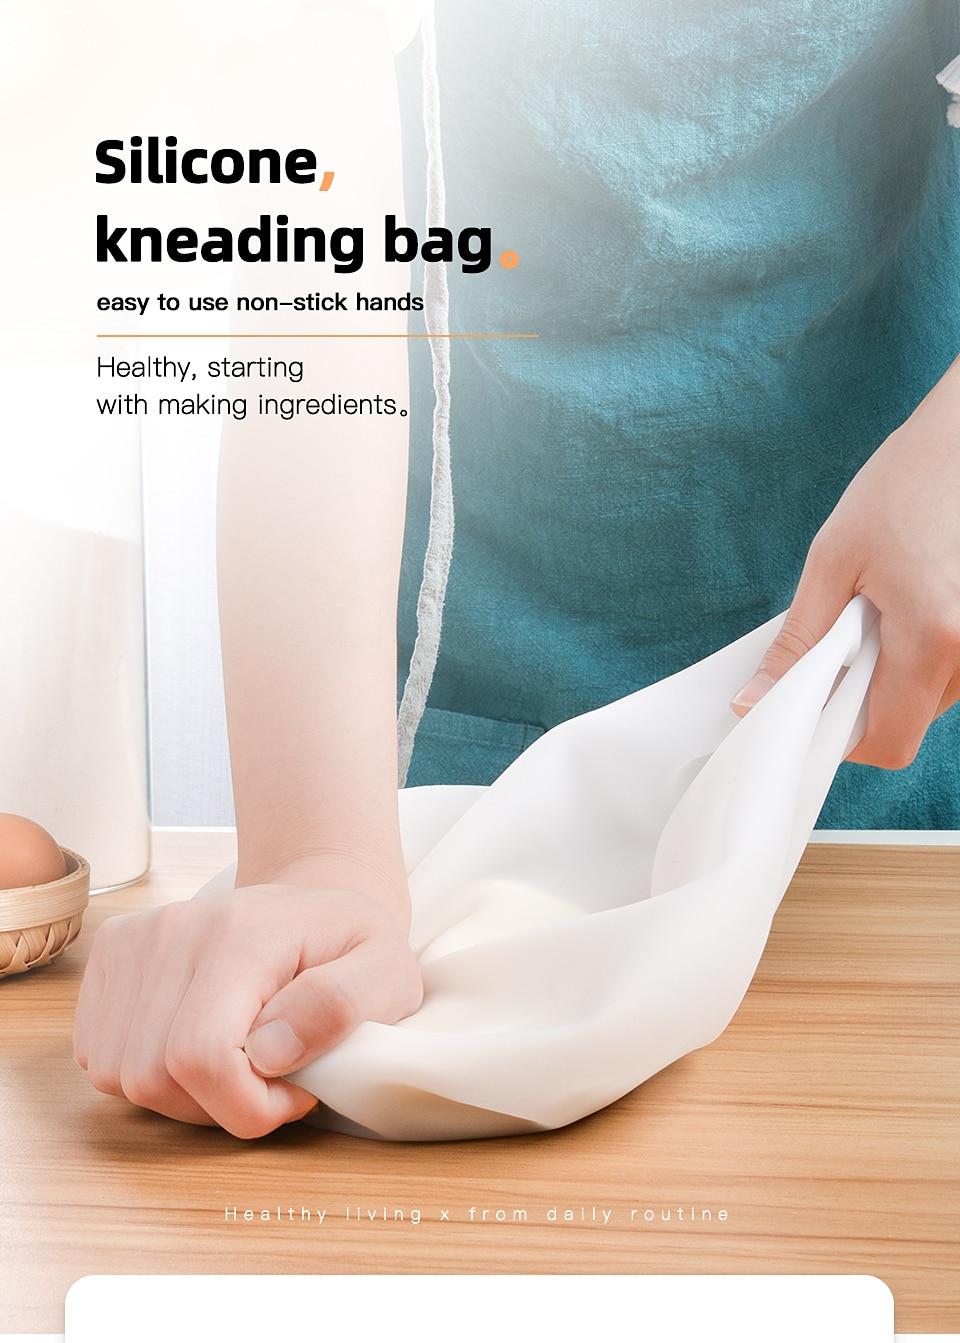 SILIKOLOVE 1.5KG Silicone Kneading Dough Bag Flour Mixer Bag Versatile Dough Mixer for Bread Pastry Pizza Kitchen Tools